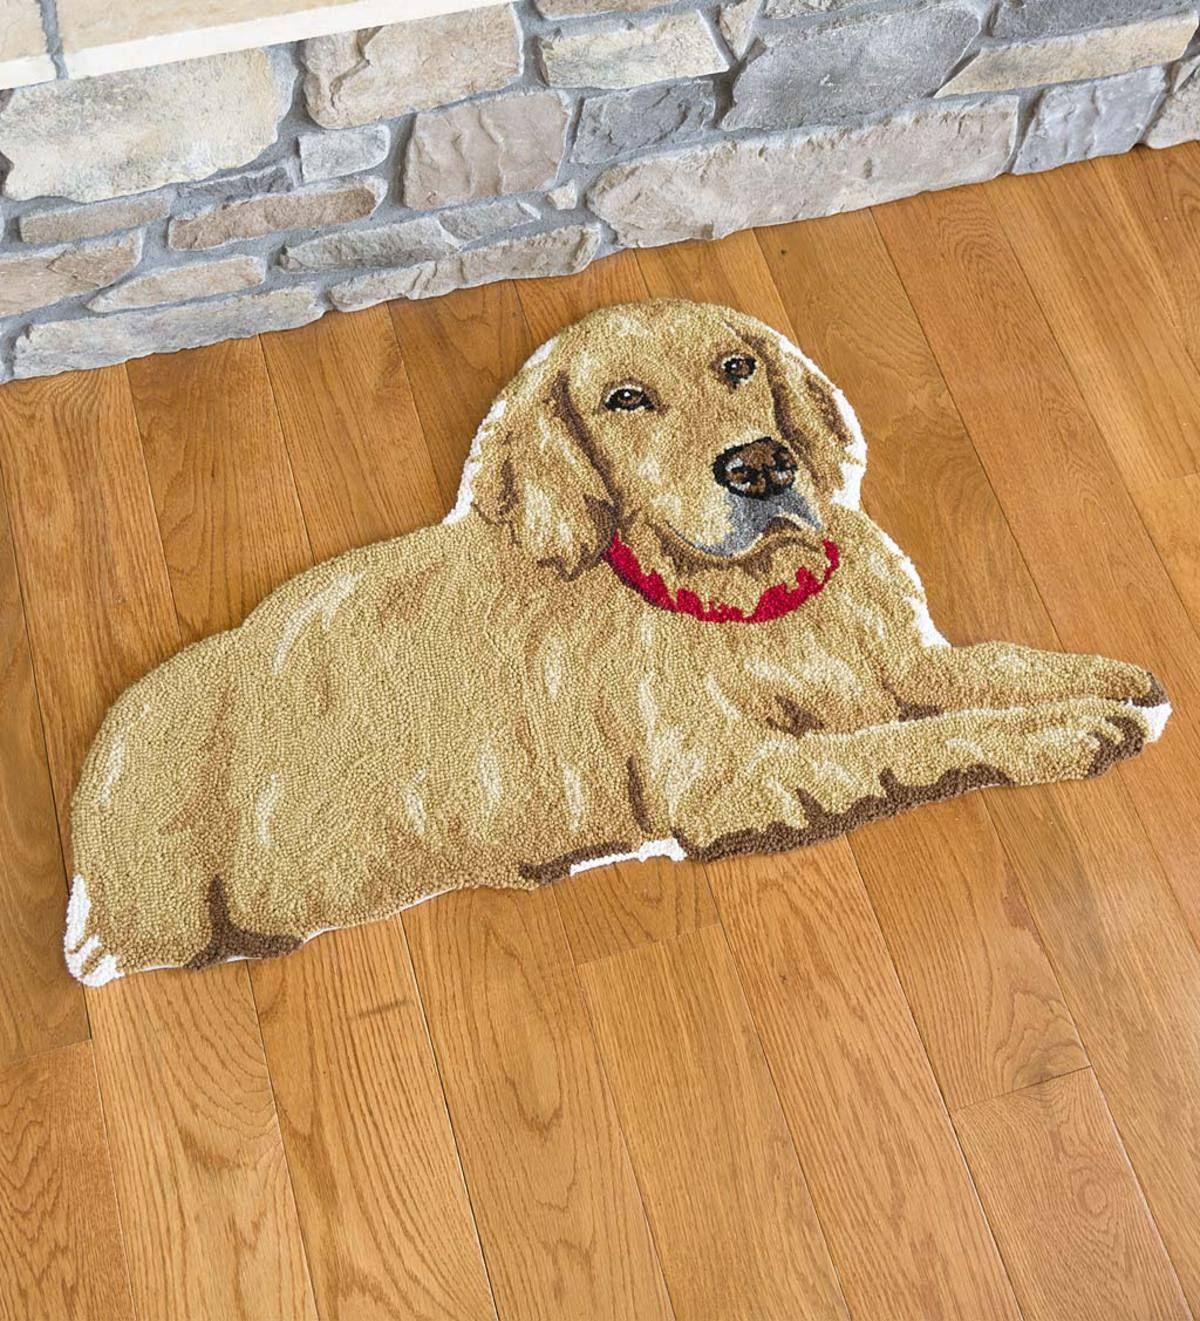 Golden Retriever Wool Rug Plowhearth In 2020 Golden Retriever Retriever Wool Rug